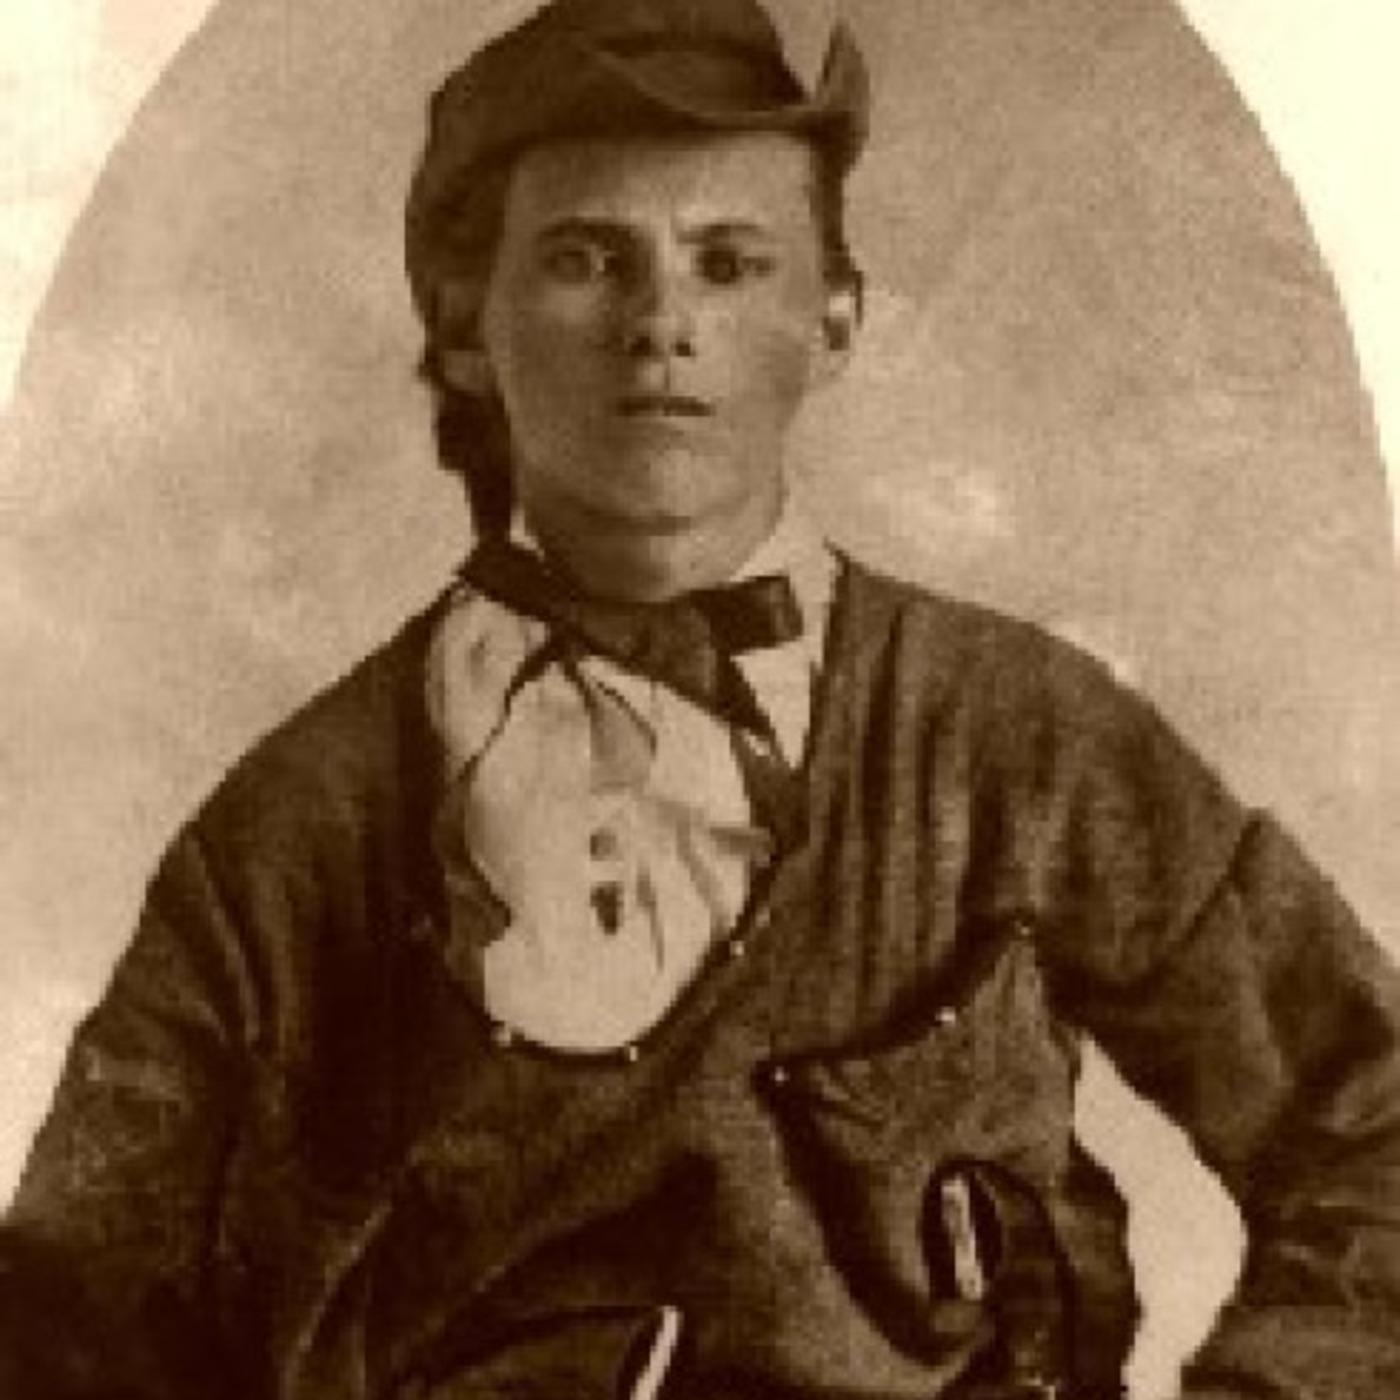 Jesse James Outlaw Travel -jesse james story